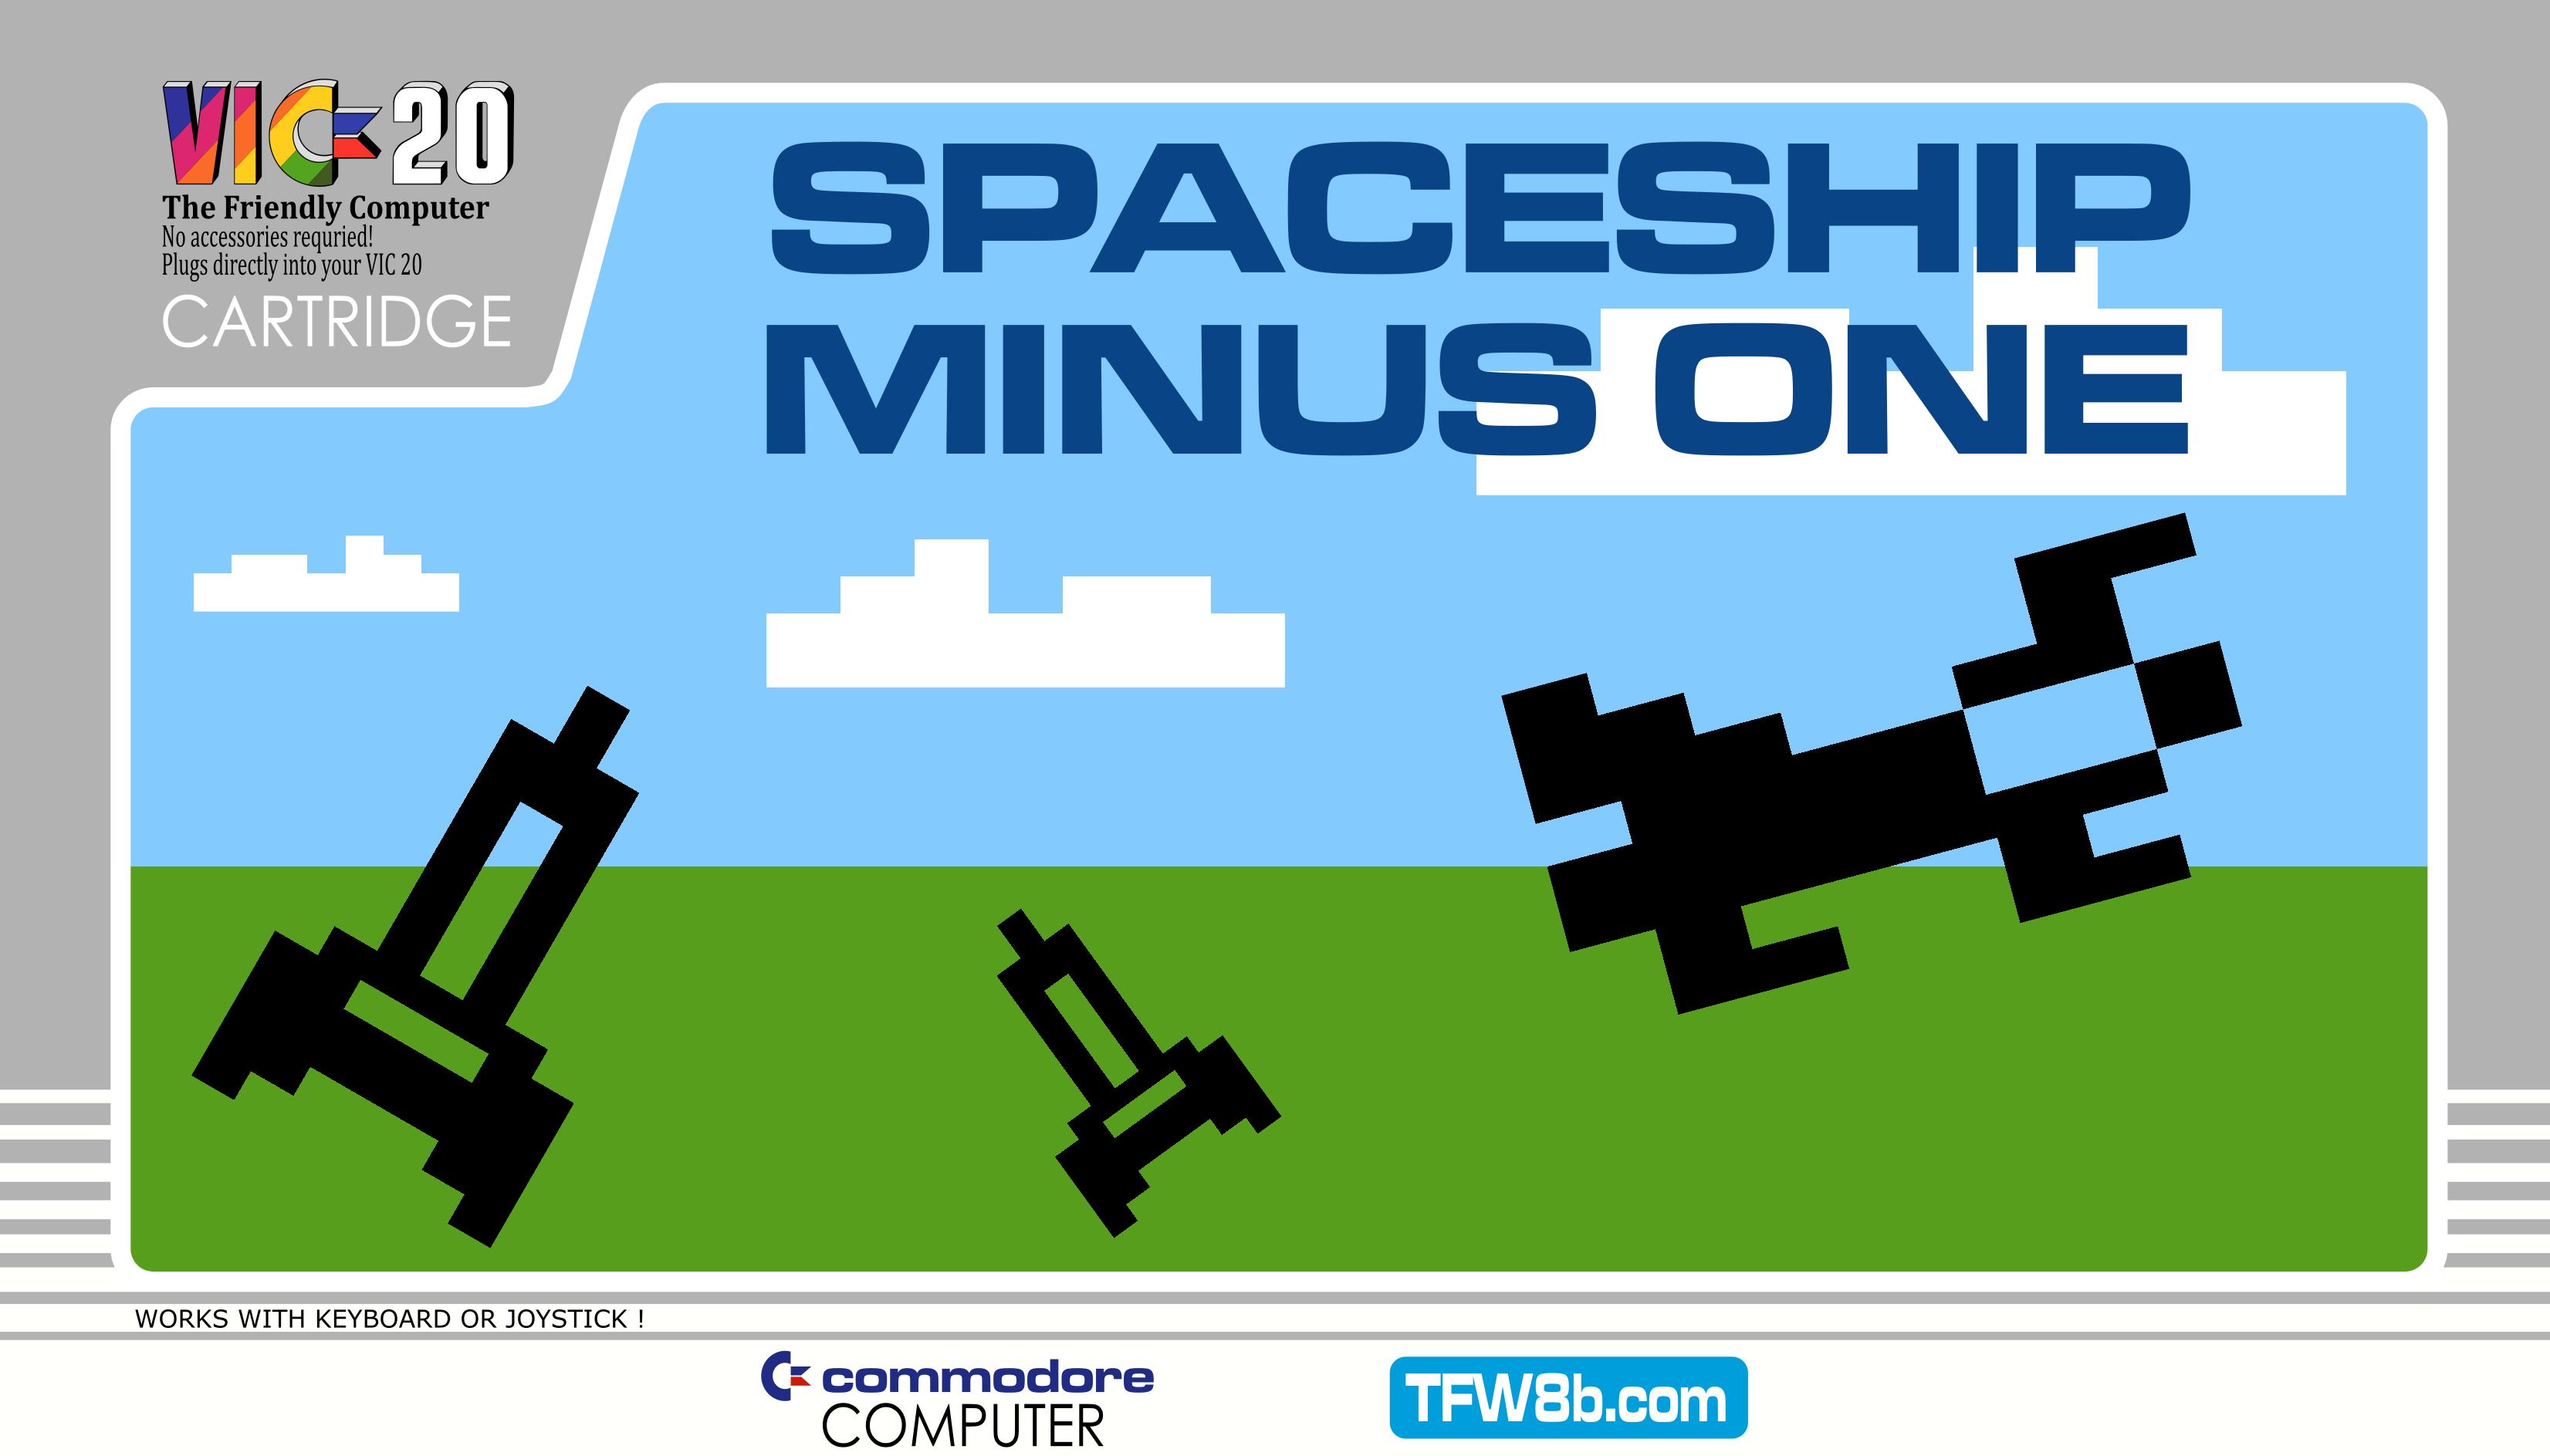 Spaceship Minus One - VIC20 Cartridge